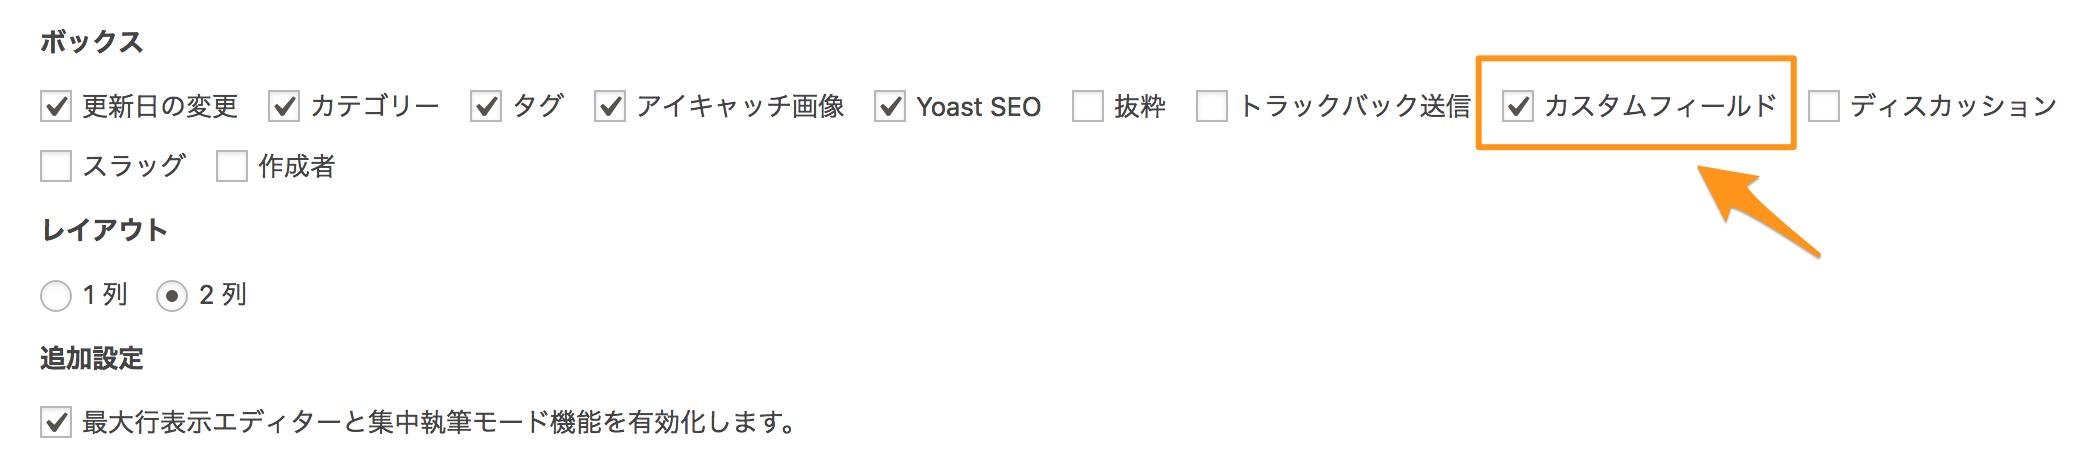 WordPressで「カスタムフィールド」を使うための設定方法